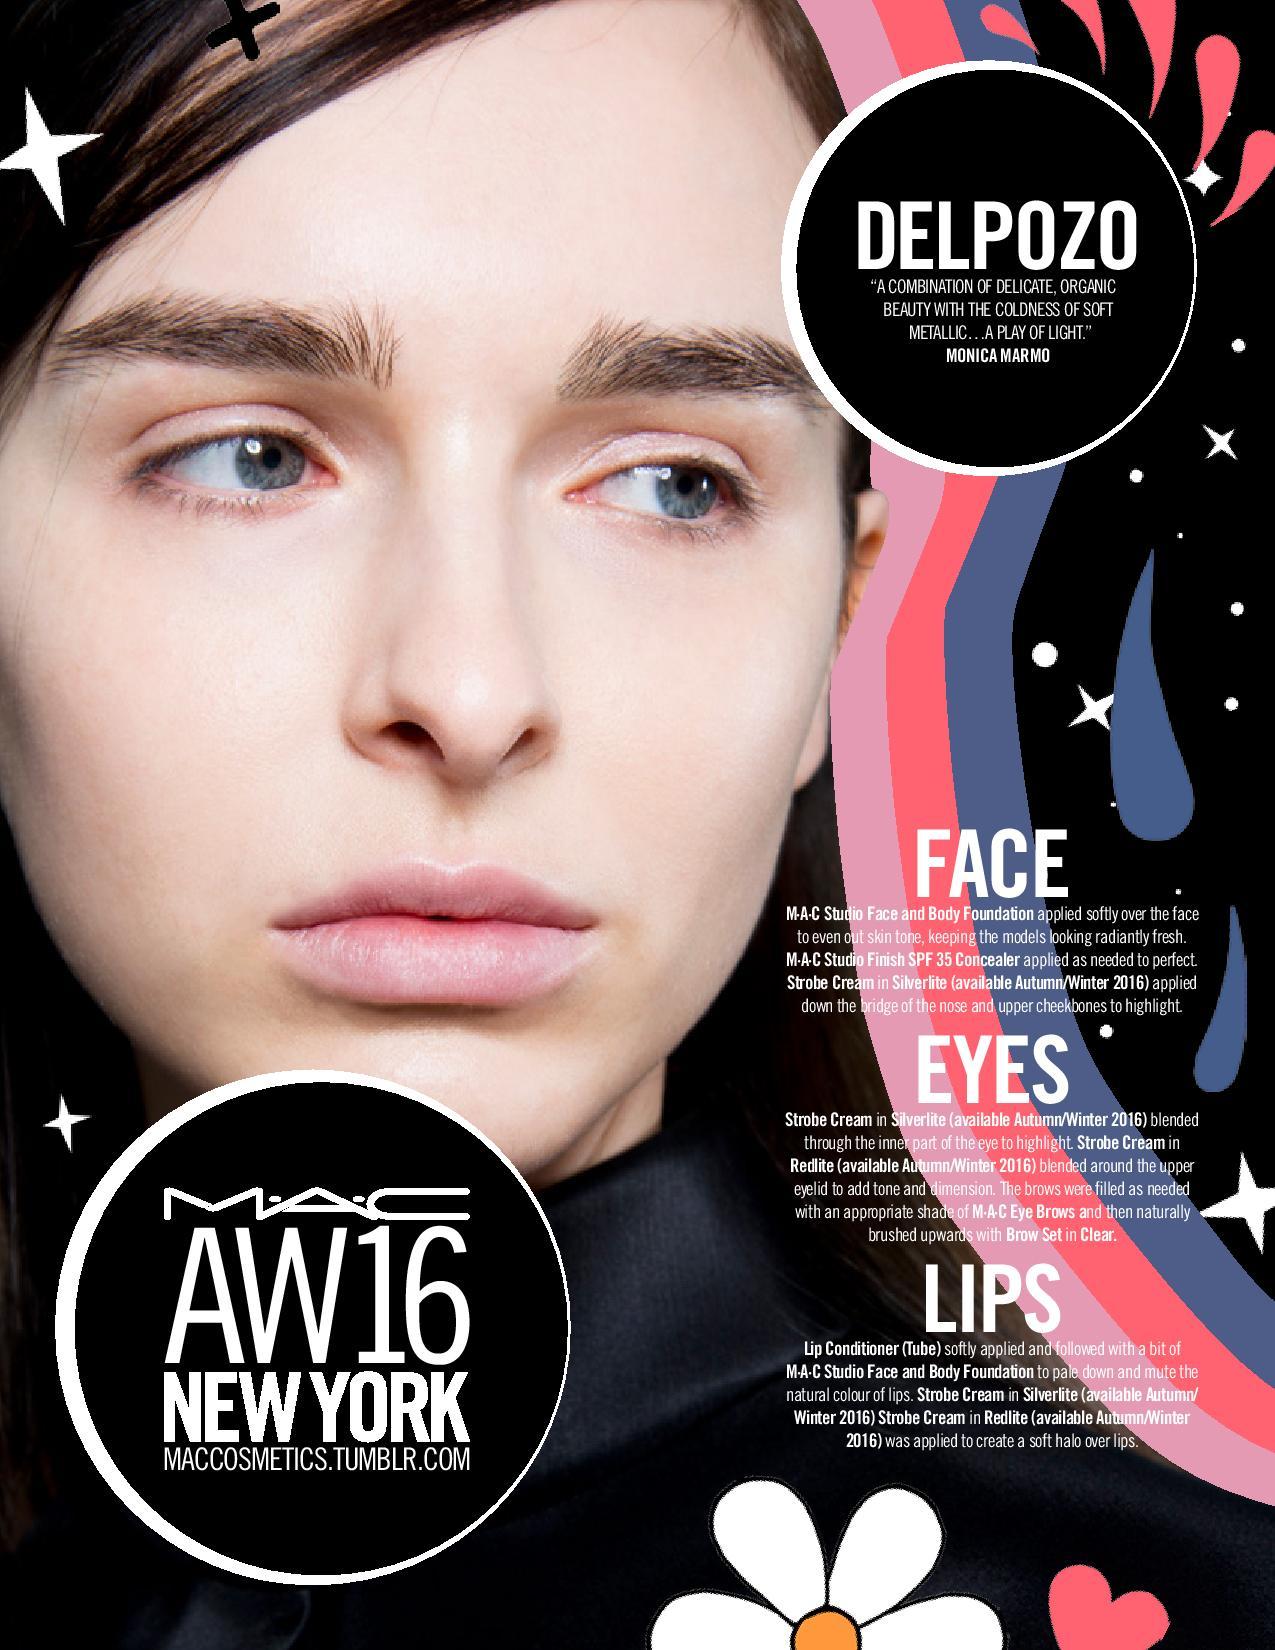 AW16_DAILY FACECHART_NEW YORK_FEB 17 (Delpozo, Michael Kors, Proenza Sch...-page-002